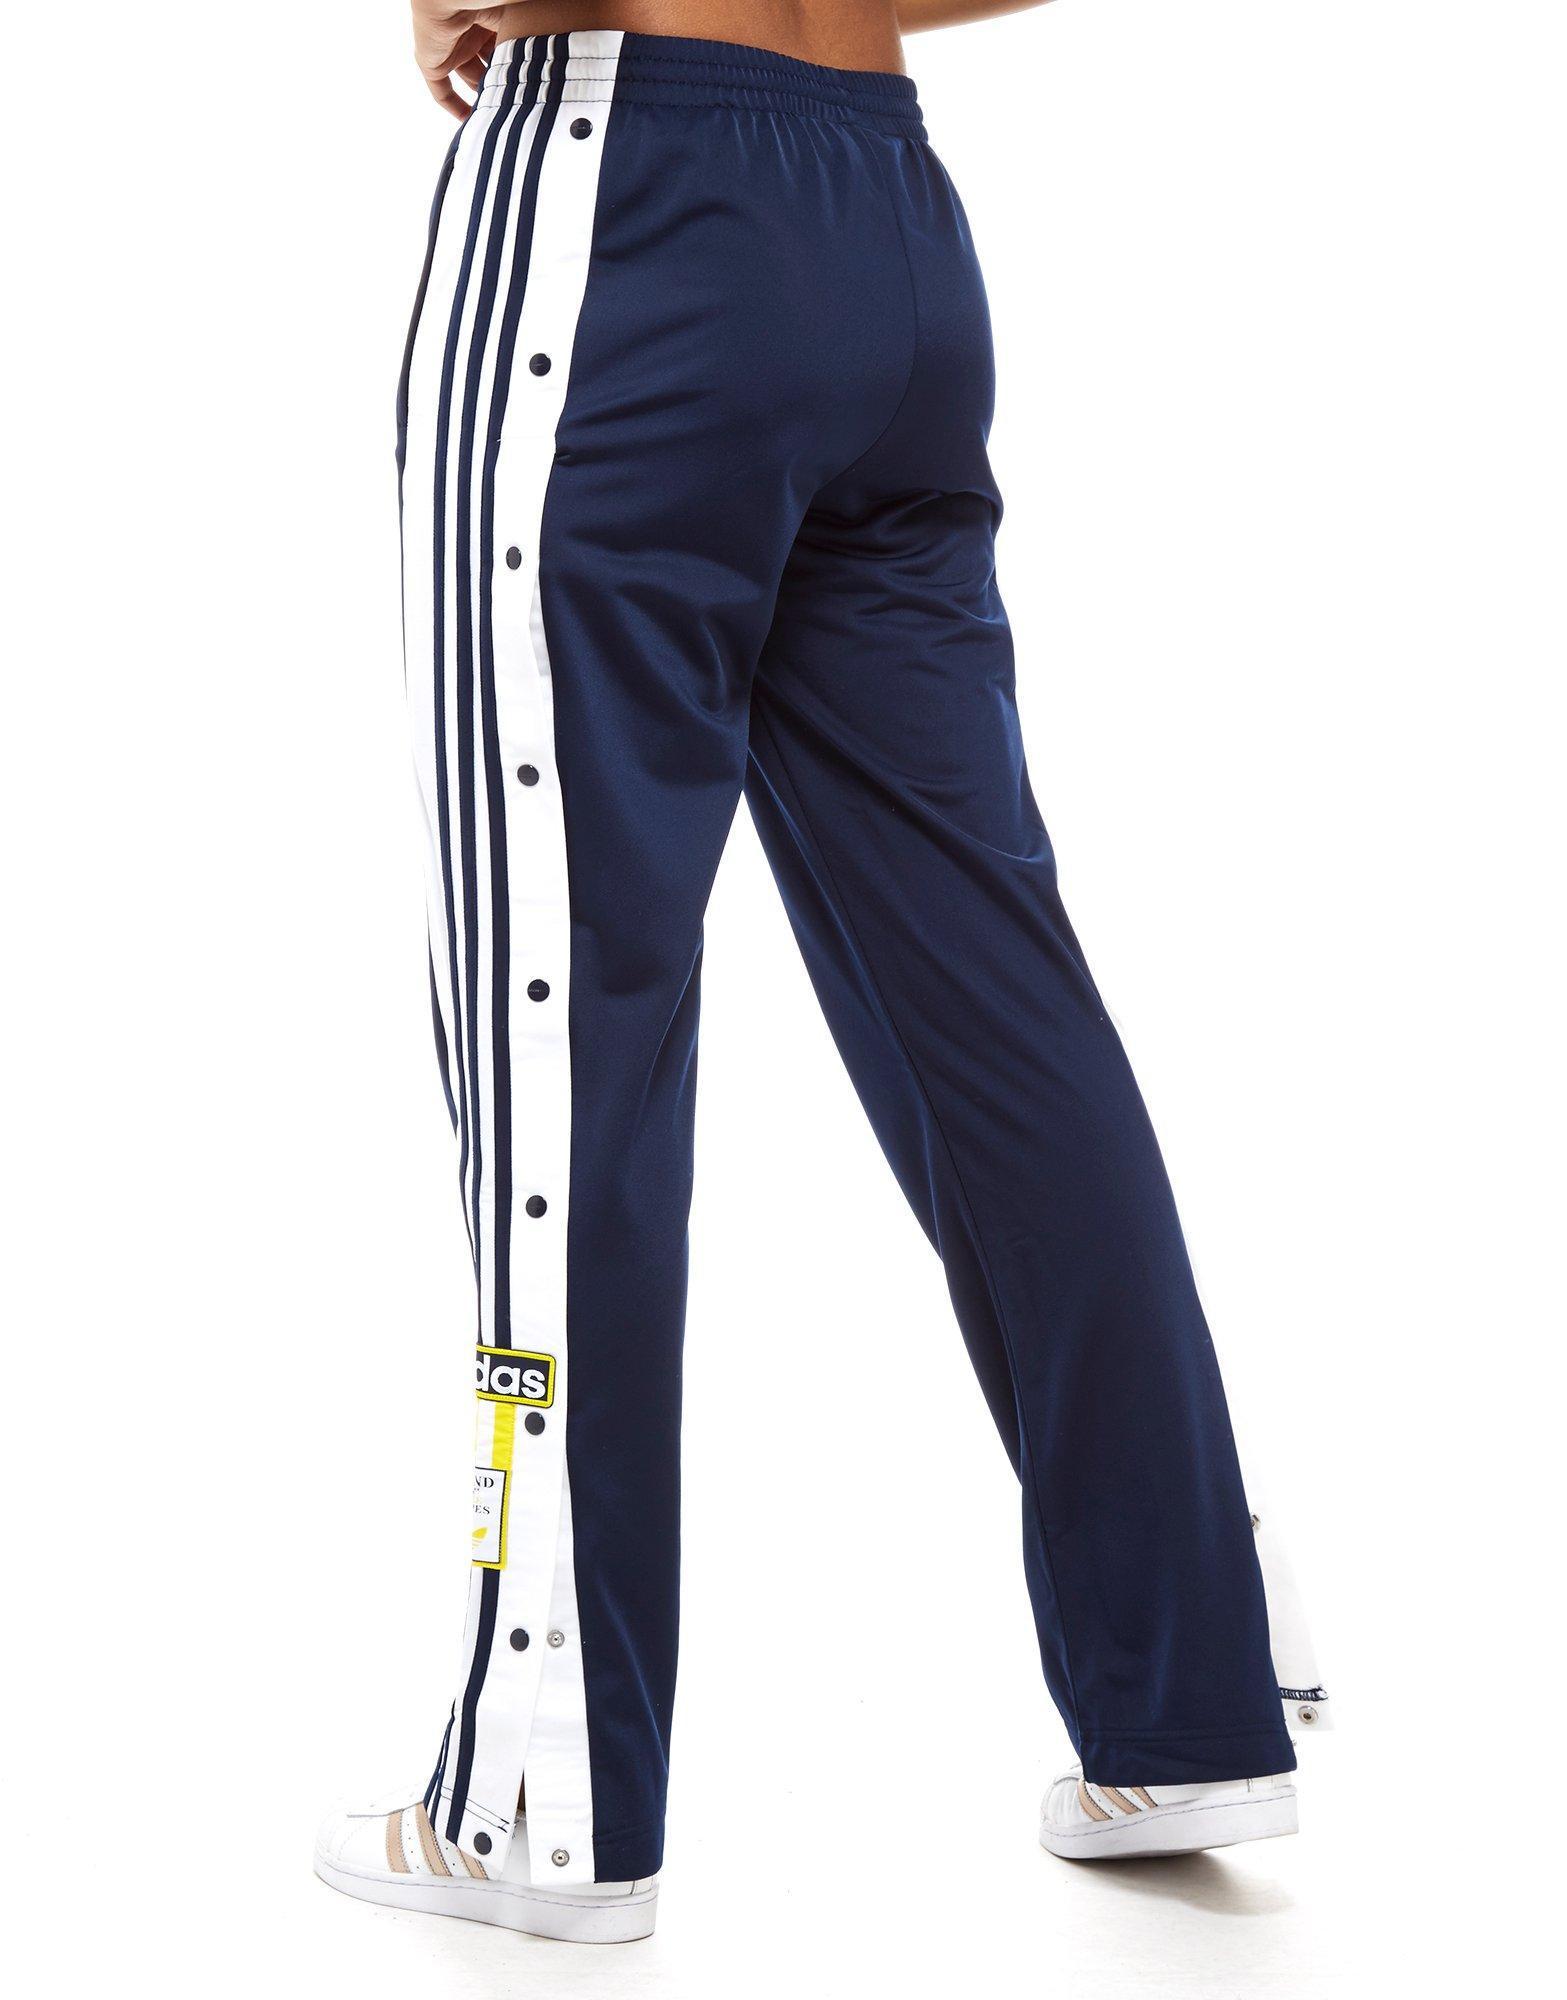 huge discount 066cc 6c756 Lyst - adidas Originals Adibreak Popper Pants in Blue